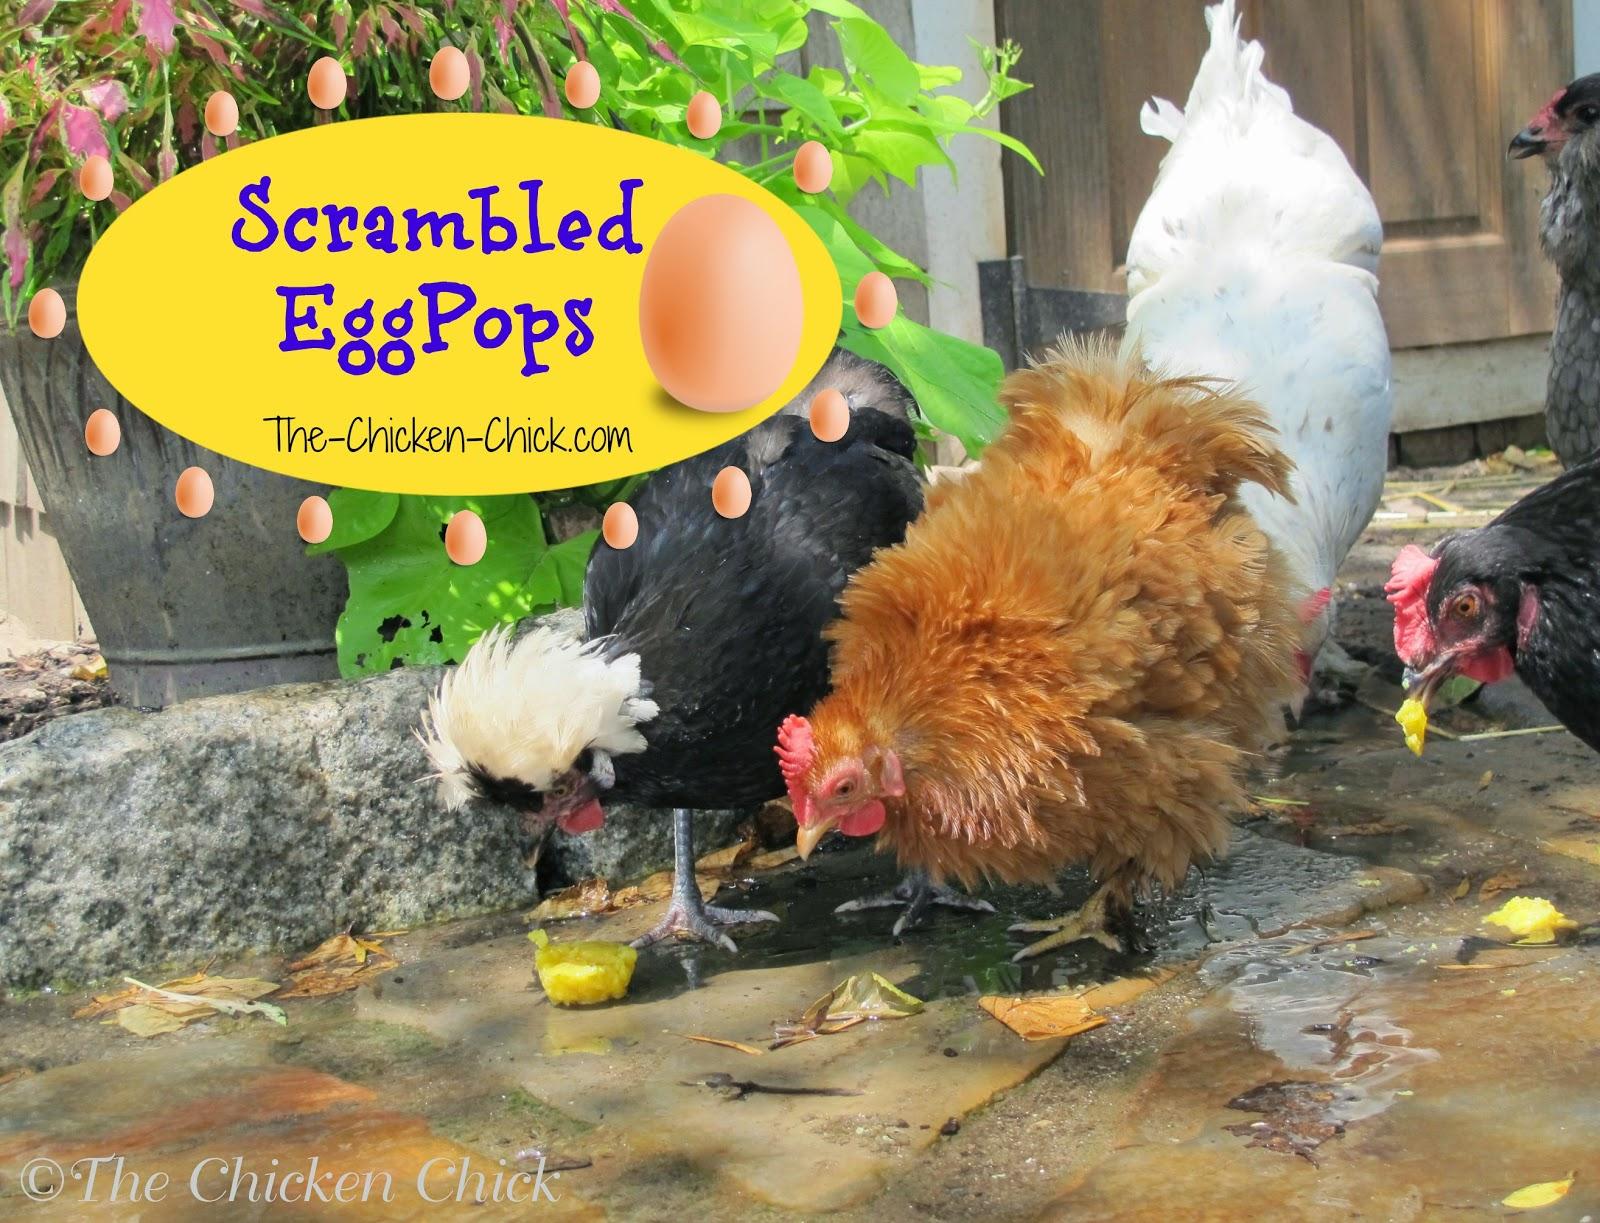 Frozen Scrambled Eggpops